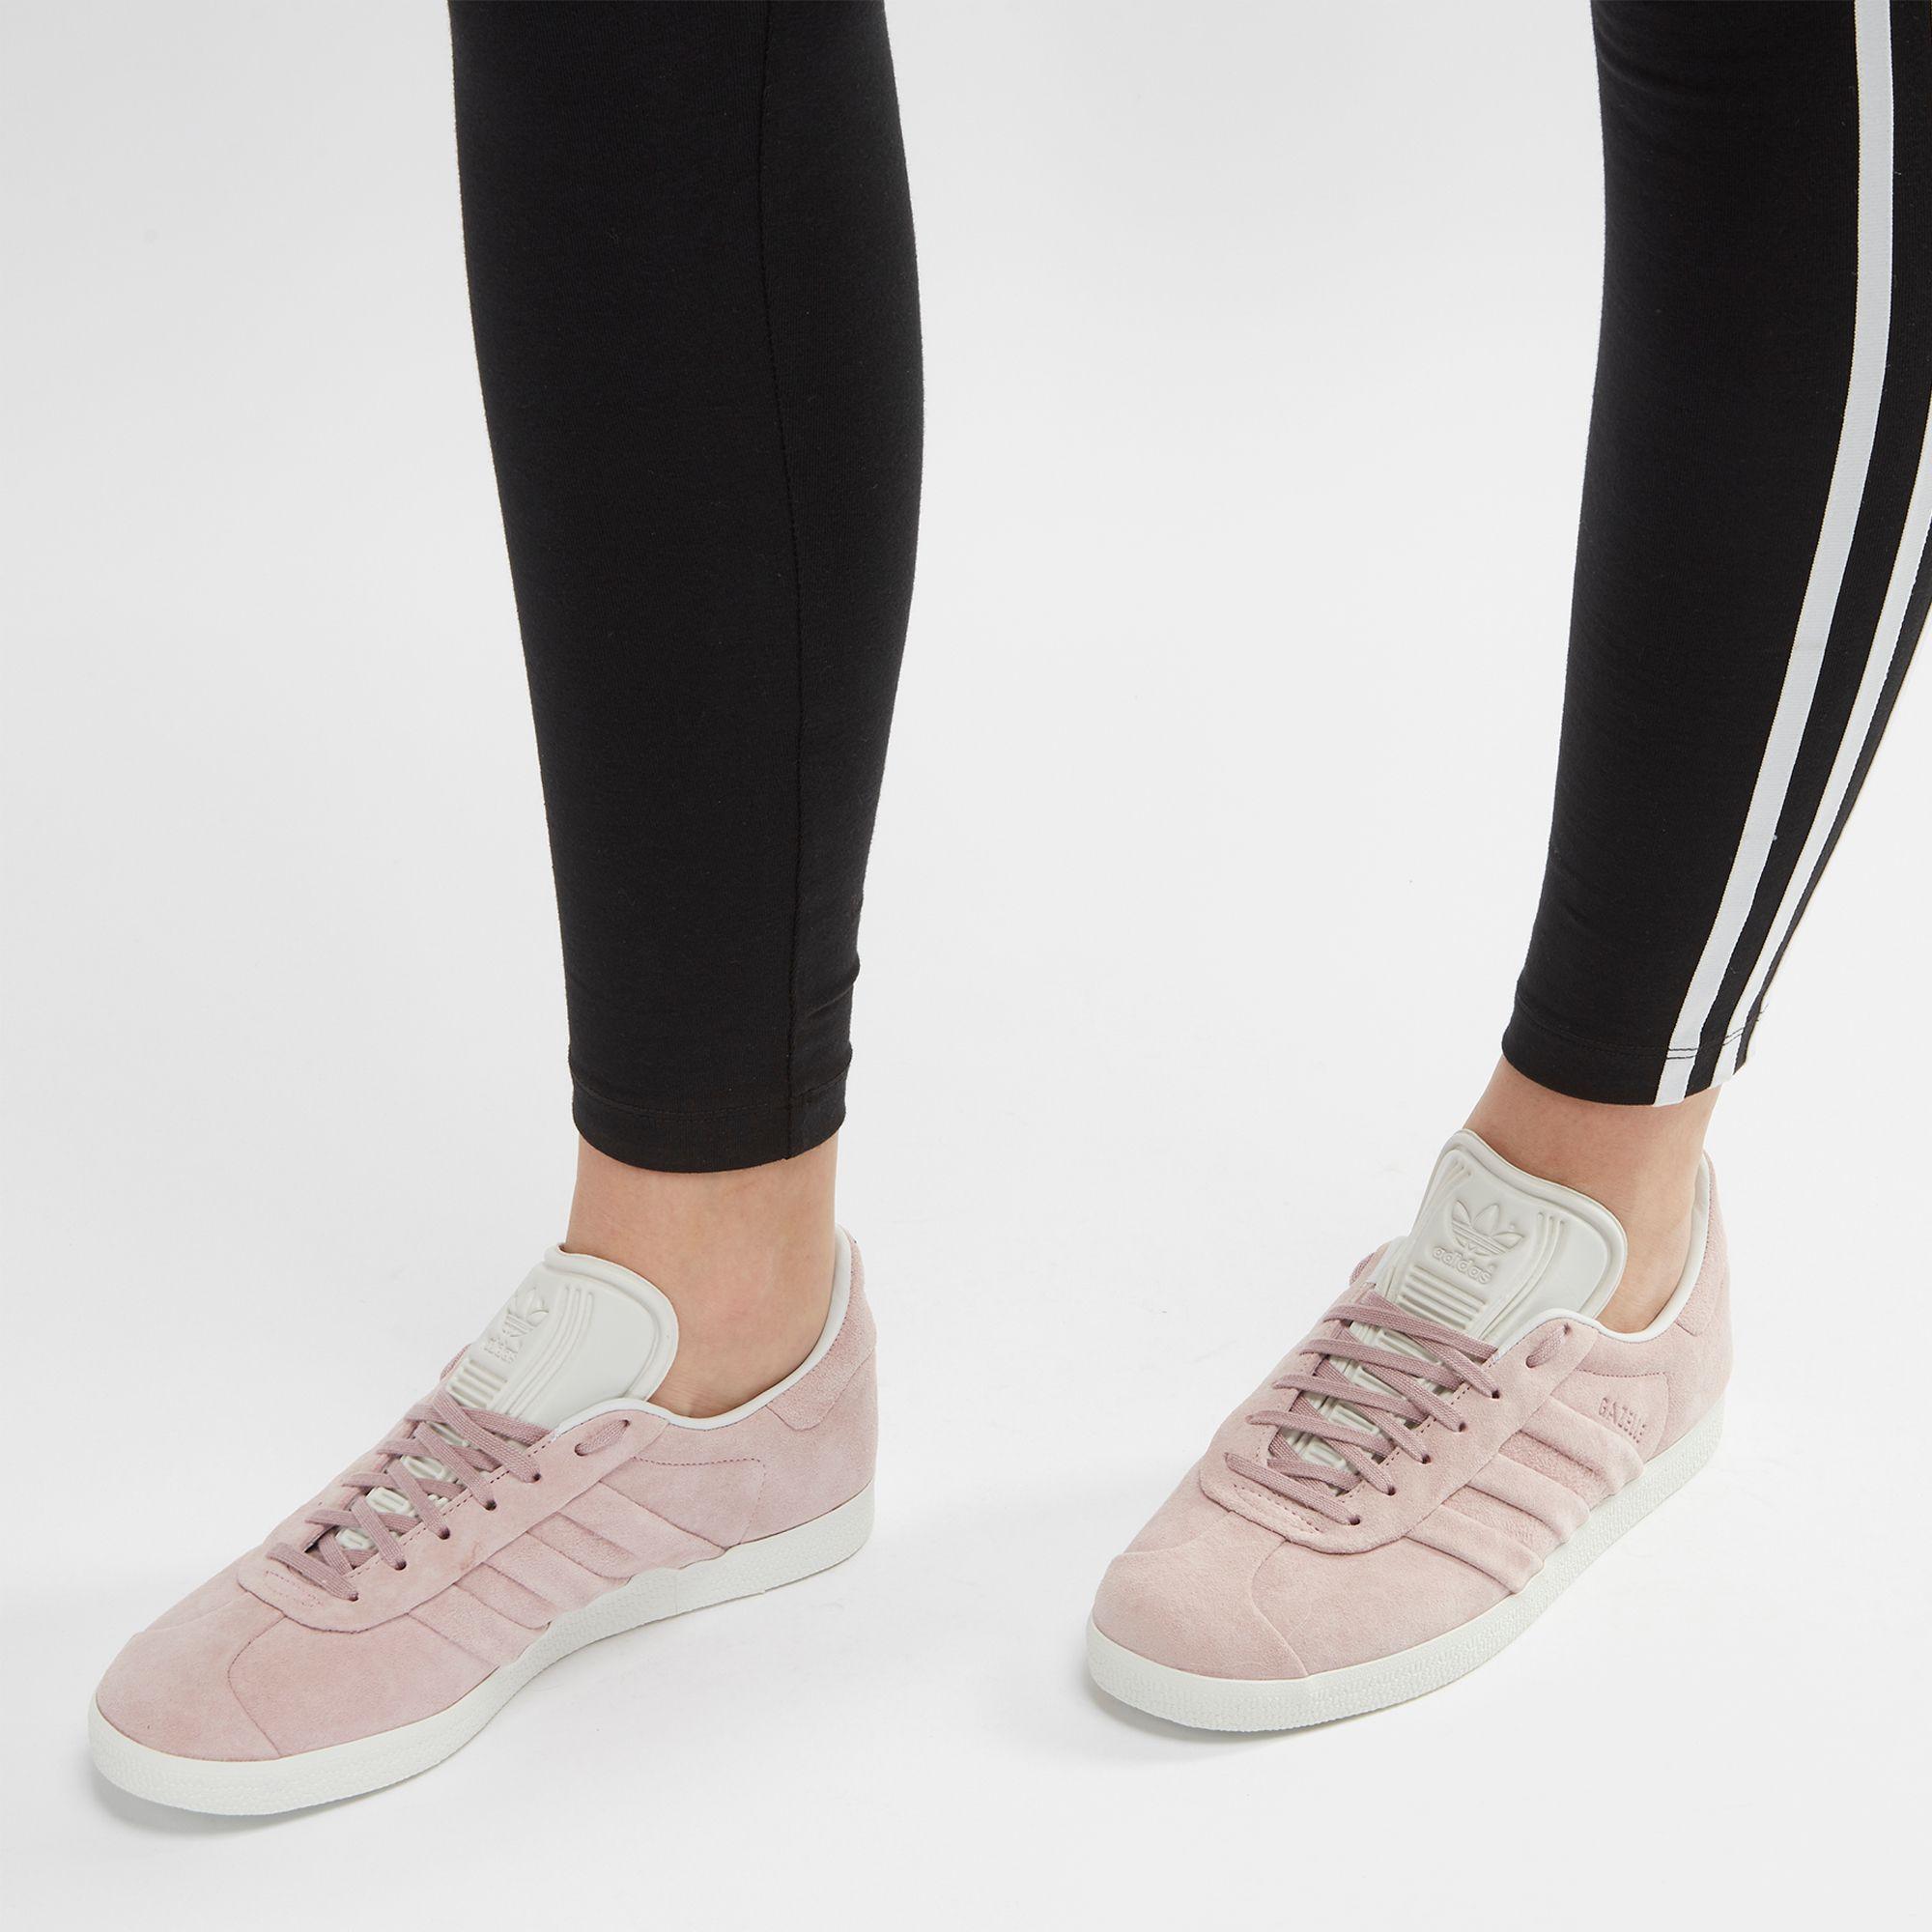 adidas Originals Gazelle Stitch and Turn Shoe